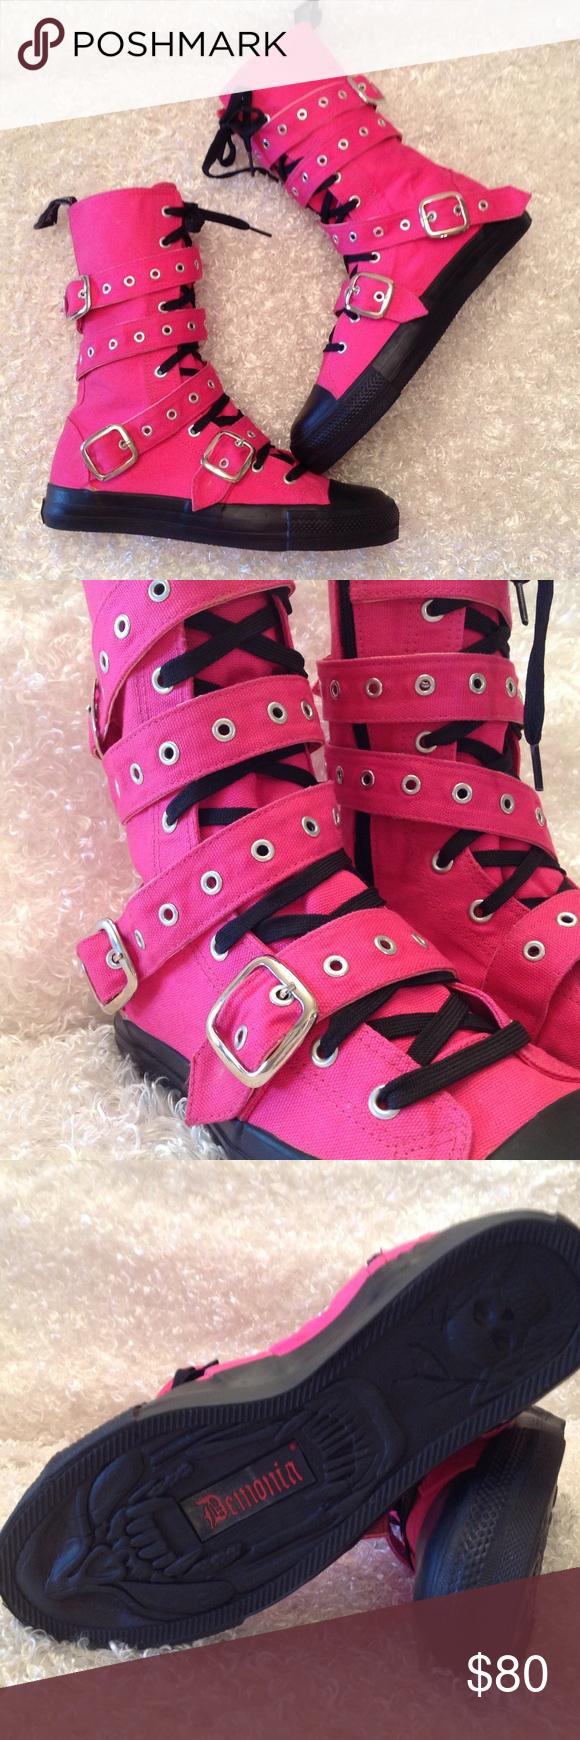 Demonia Deviant Pink Boots Aa Demonia Shoes Combat & Moto Boots